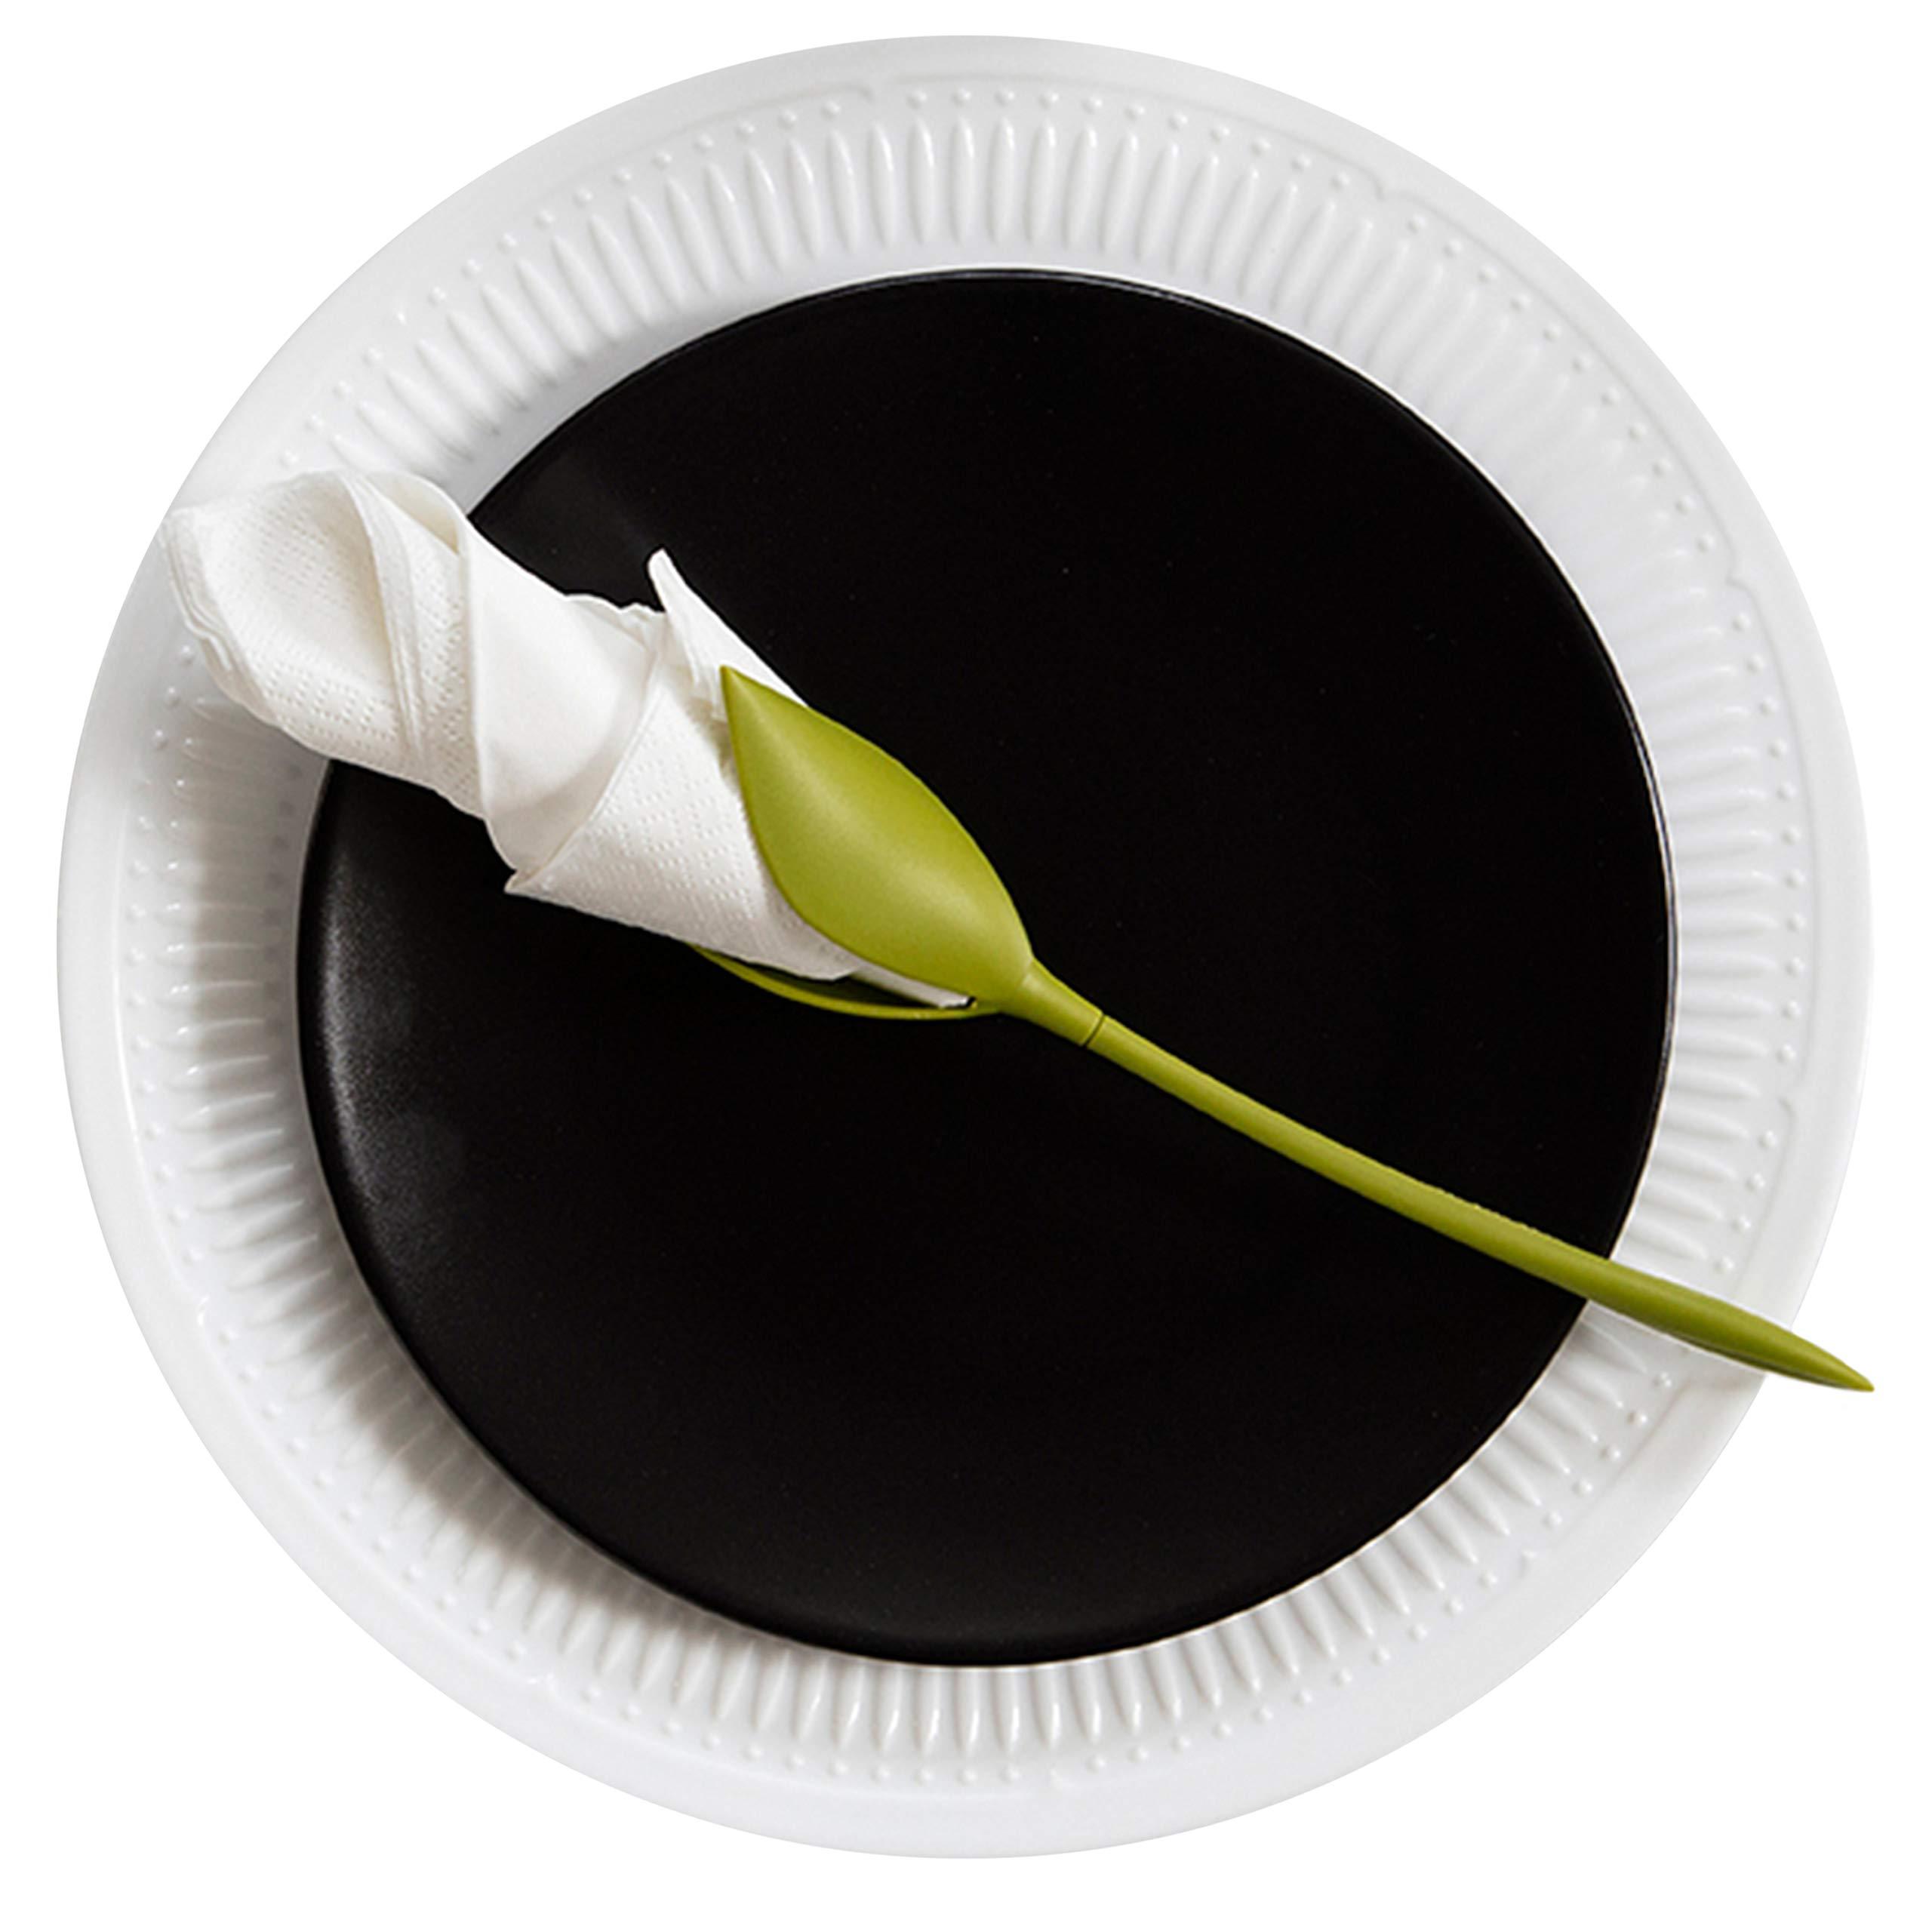 Peleg Design Bloom Napkin Holders for Tables, Set of 8 Green Stemmed Plastic Twist Flower Buds Serviette Holders Plus White Napkins for Making Original Table Arrangements by PELEG DESIGN